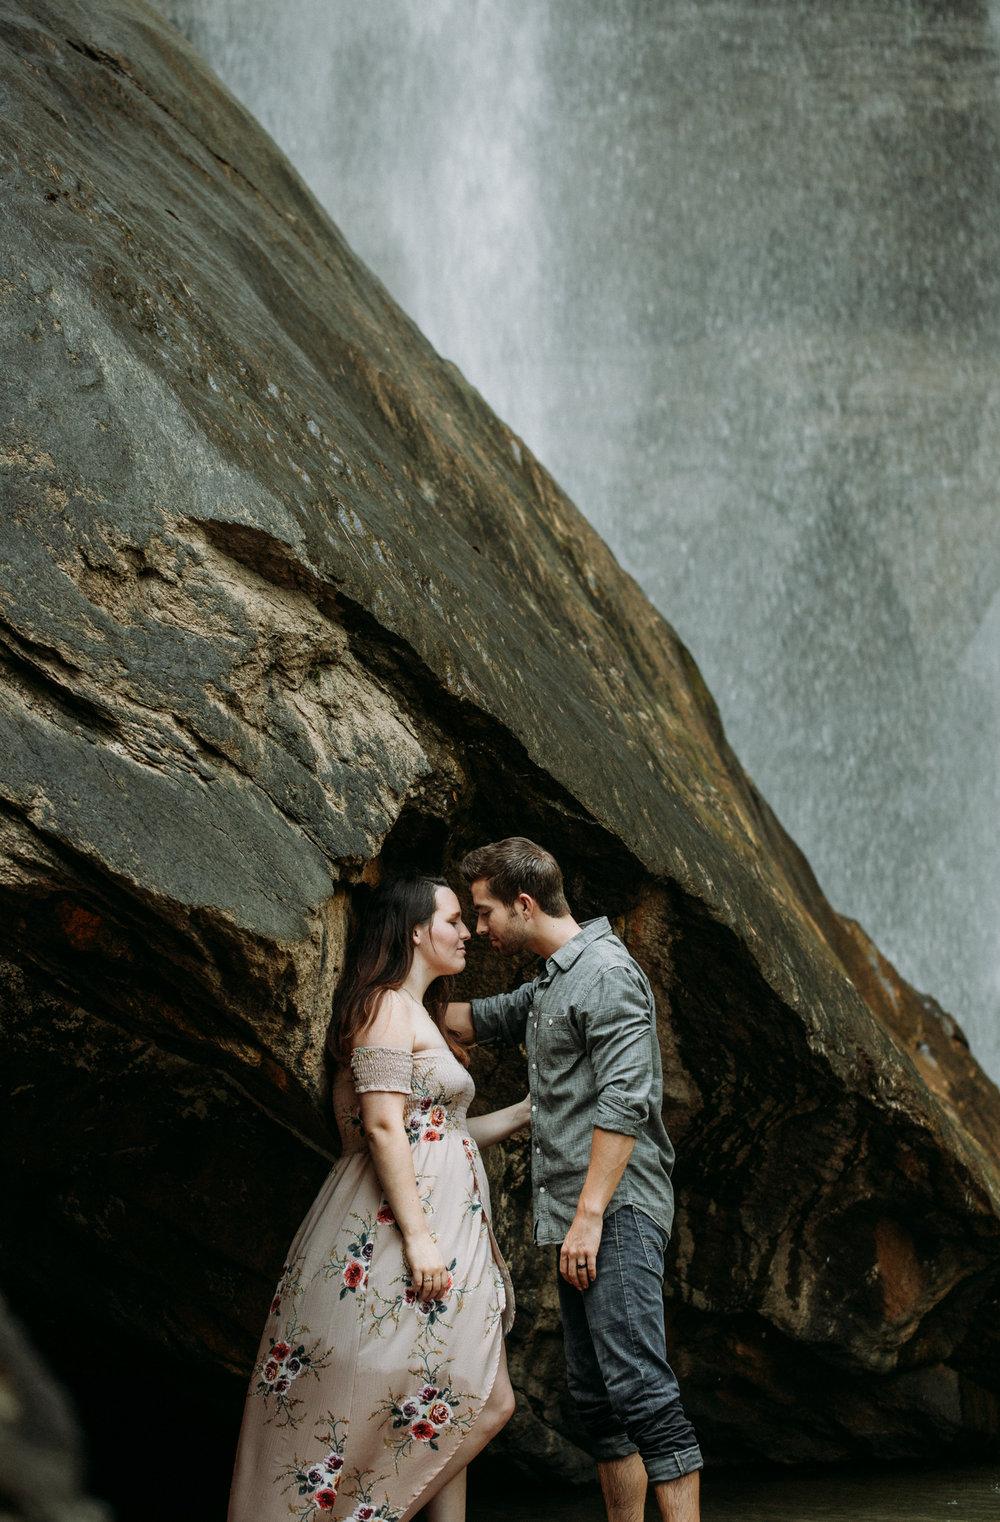 MonicaLeavell-Carolinas-Georgia-Adventure-Engagement-Photographer-51.jpg